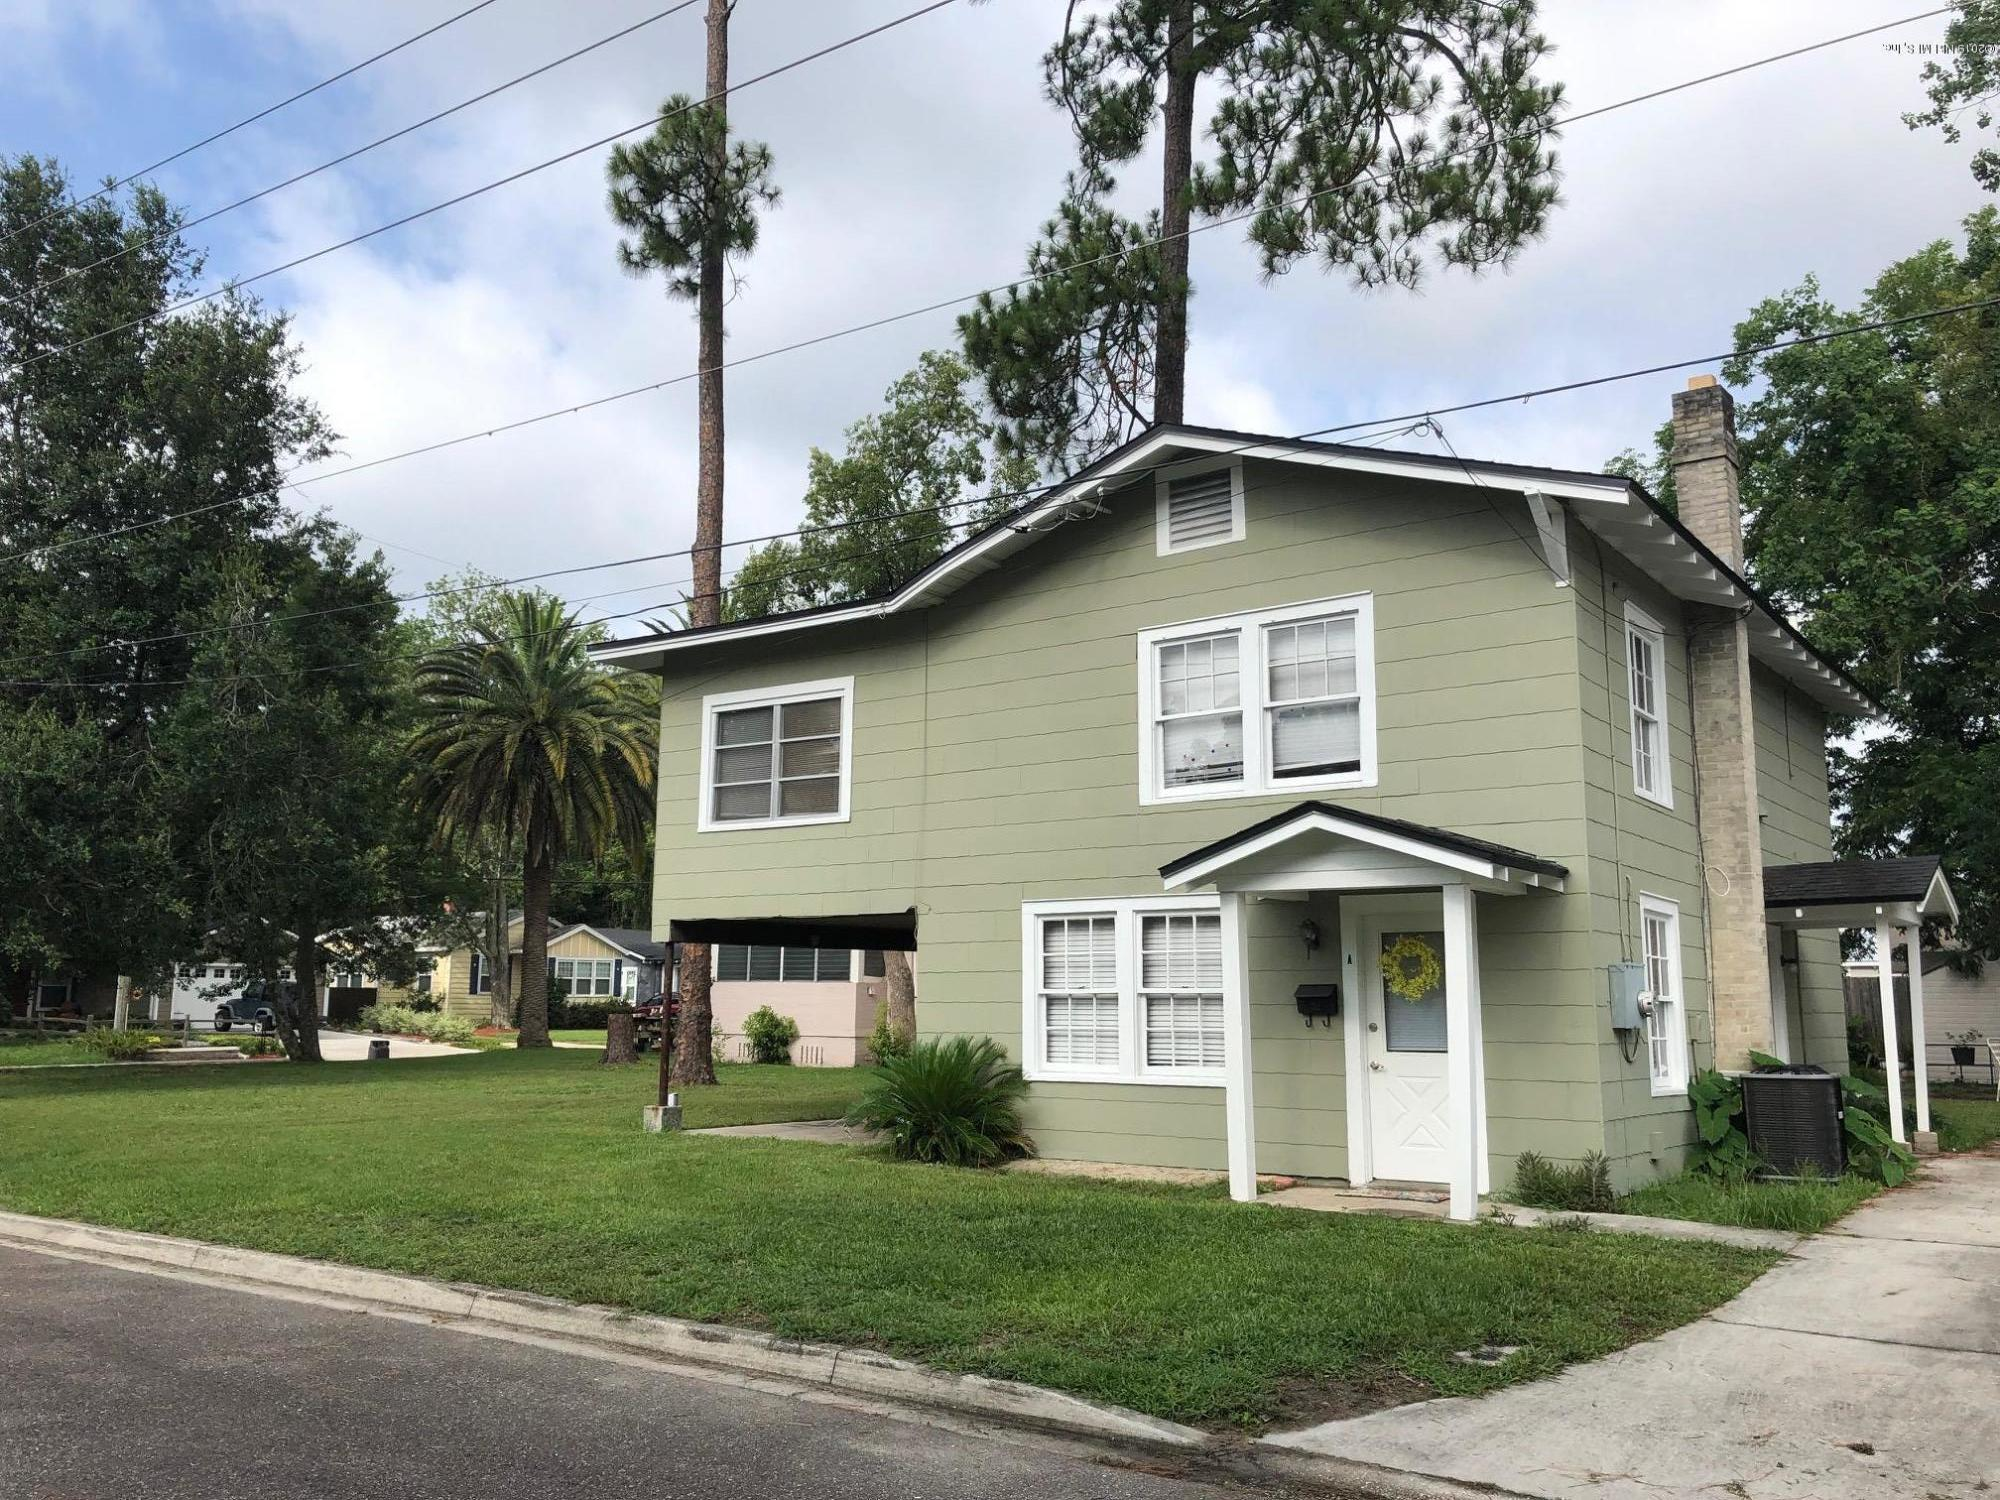 4603 Polaris St #2 Jacksonville, FL 32205